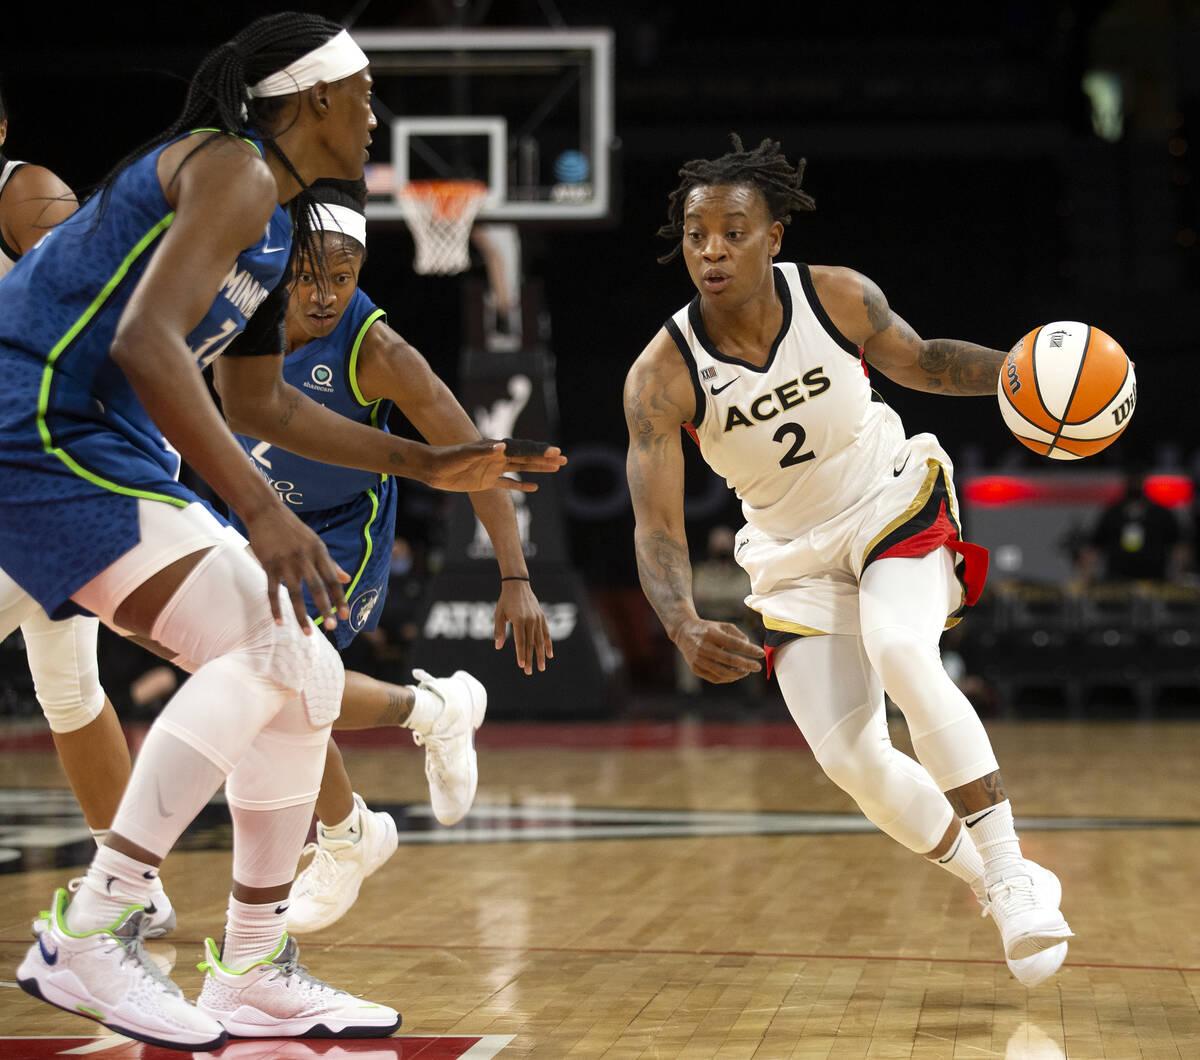 Las Vegas Aces guard Riquna Williams (2) dribbles around Minnesota Lynx center Sylvia Fowles (3 ...